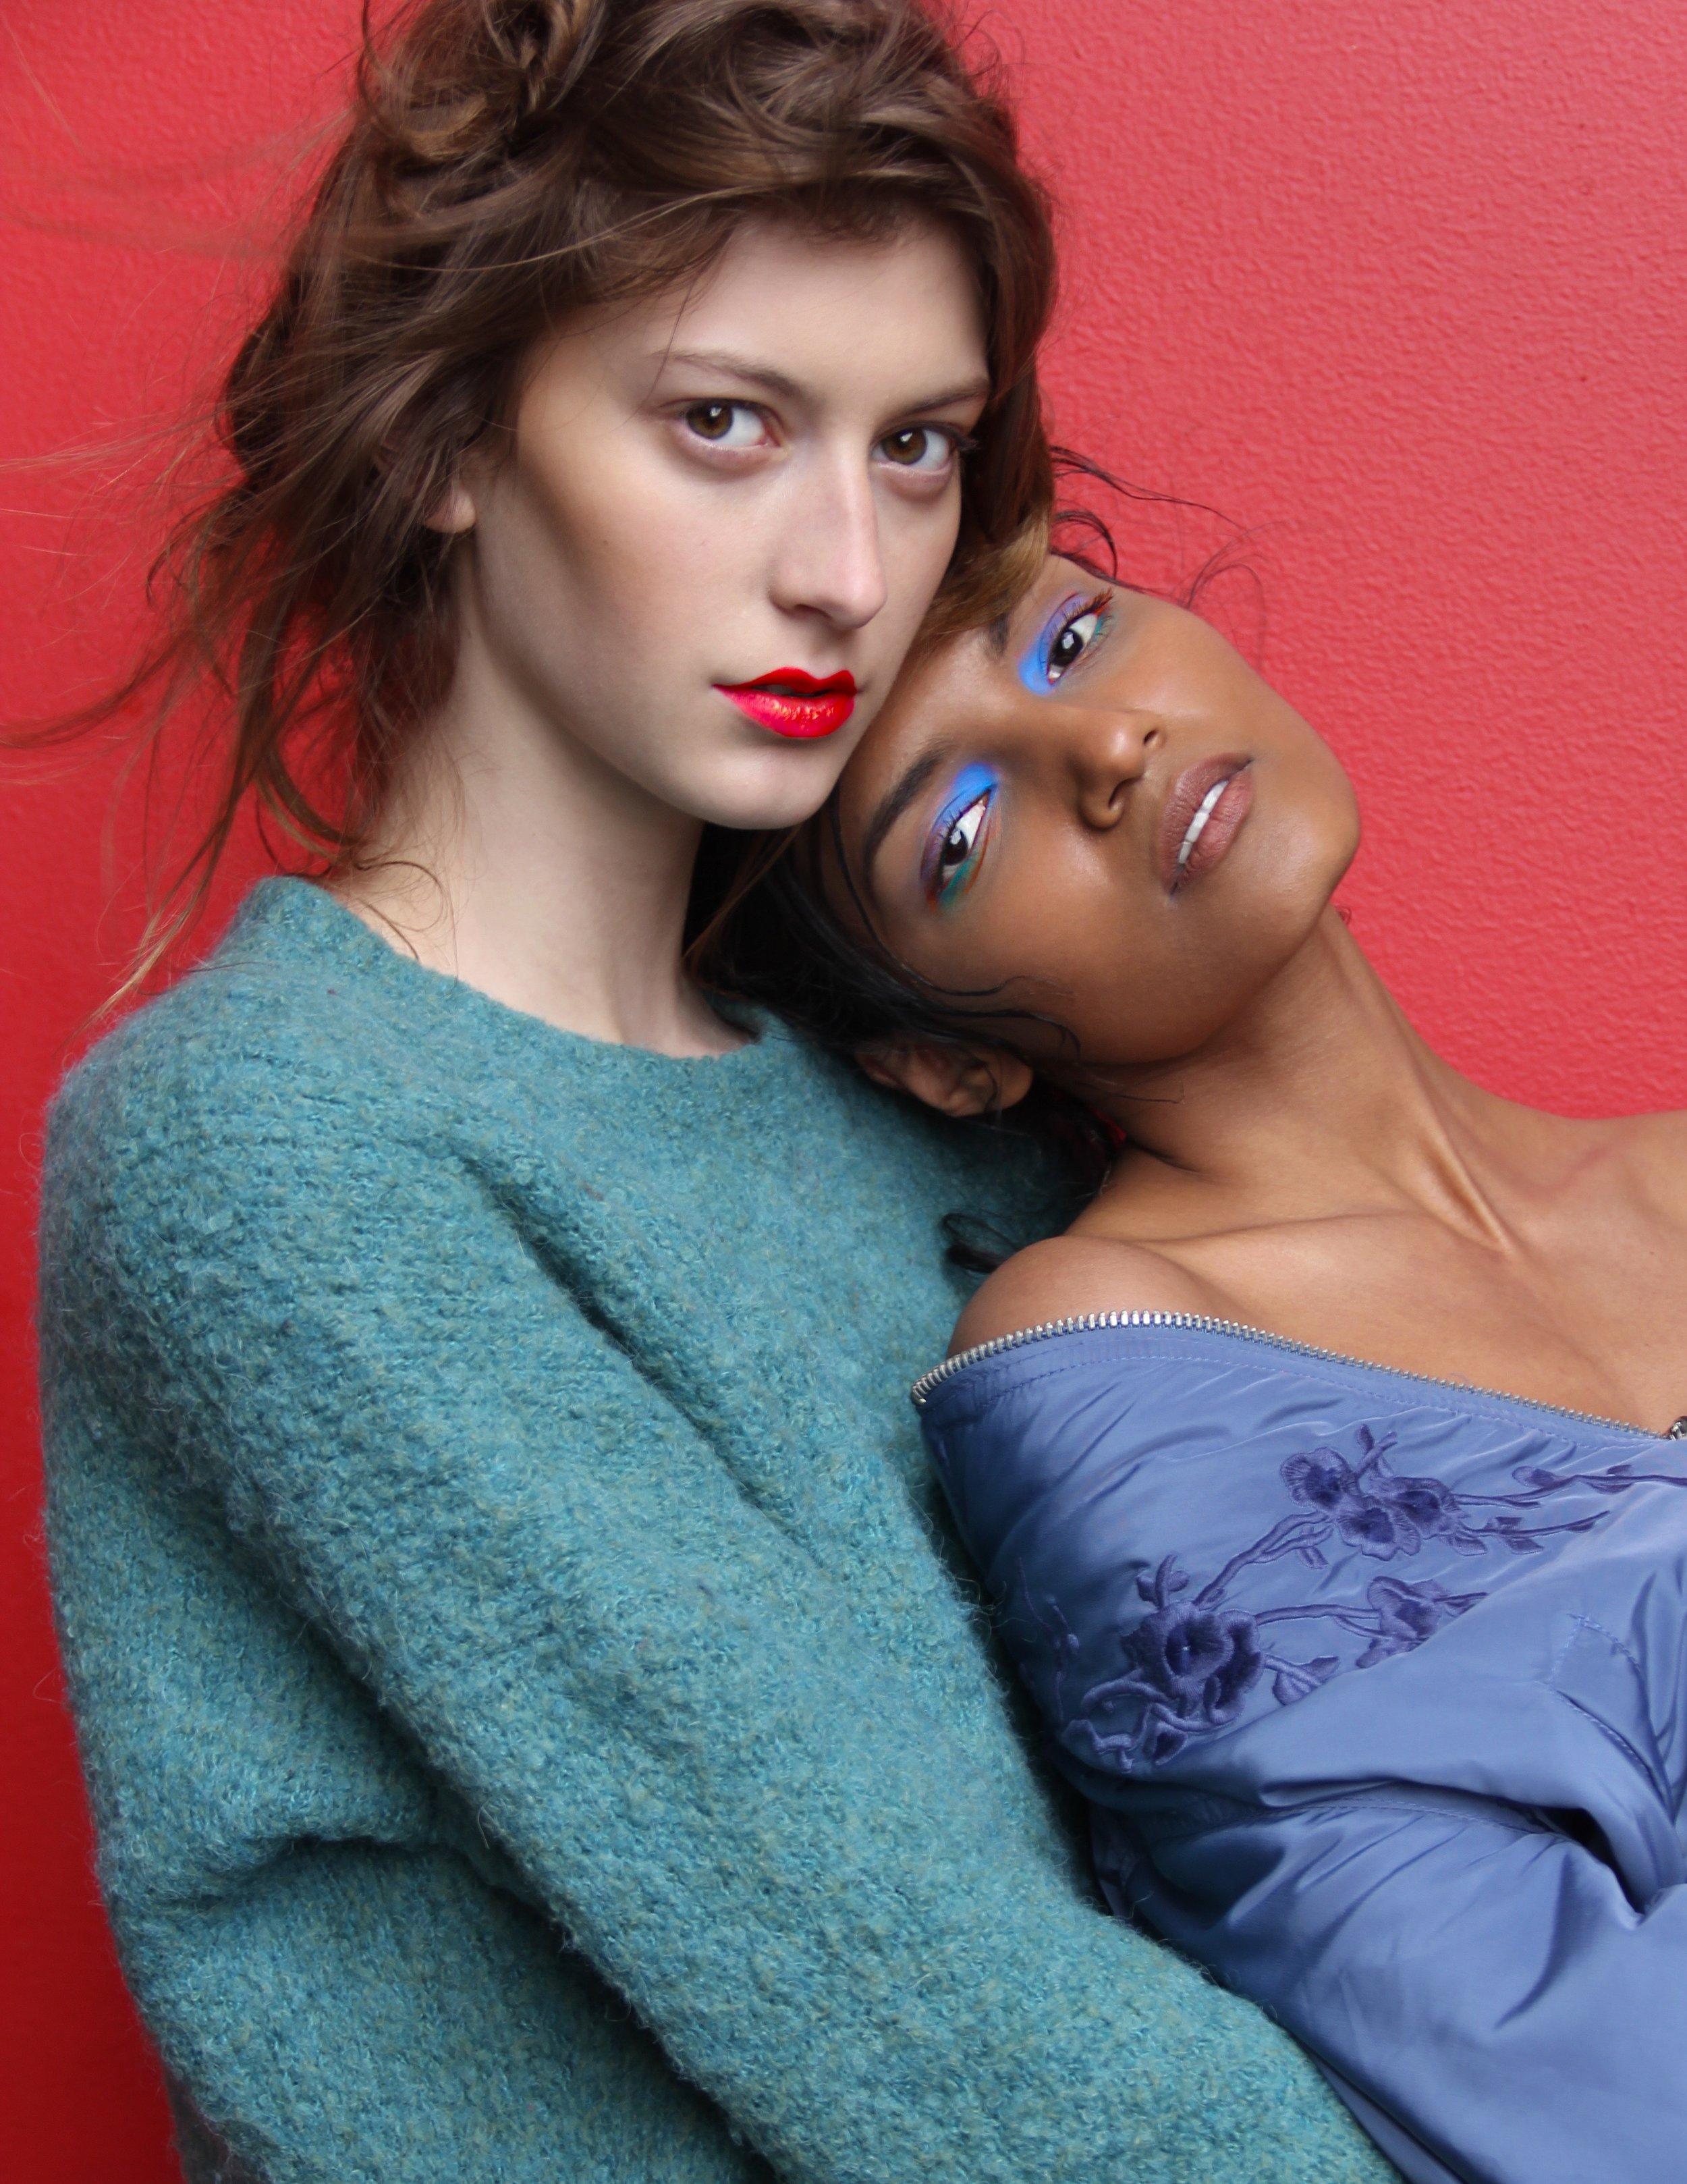 Photographer: Ivan McCartney  Models: Julia Mandirola & Shaanti Chaitram (Major Models NY)